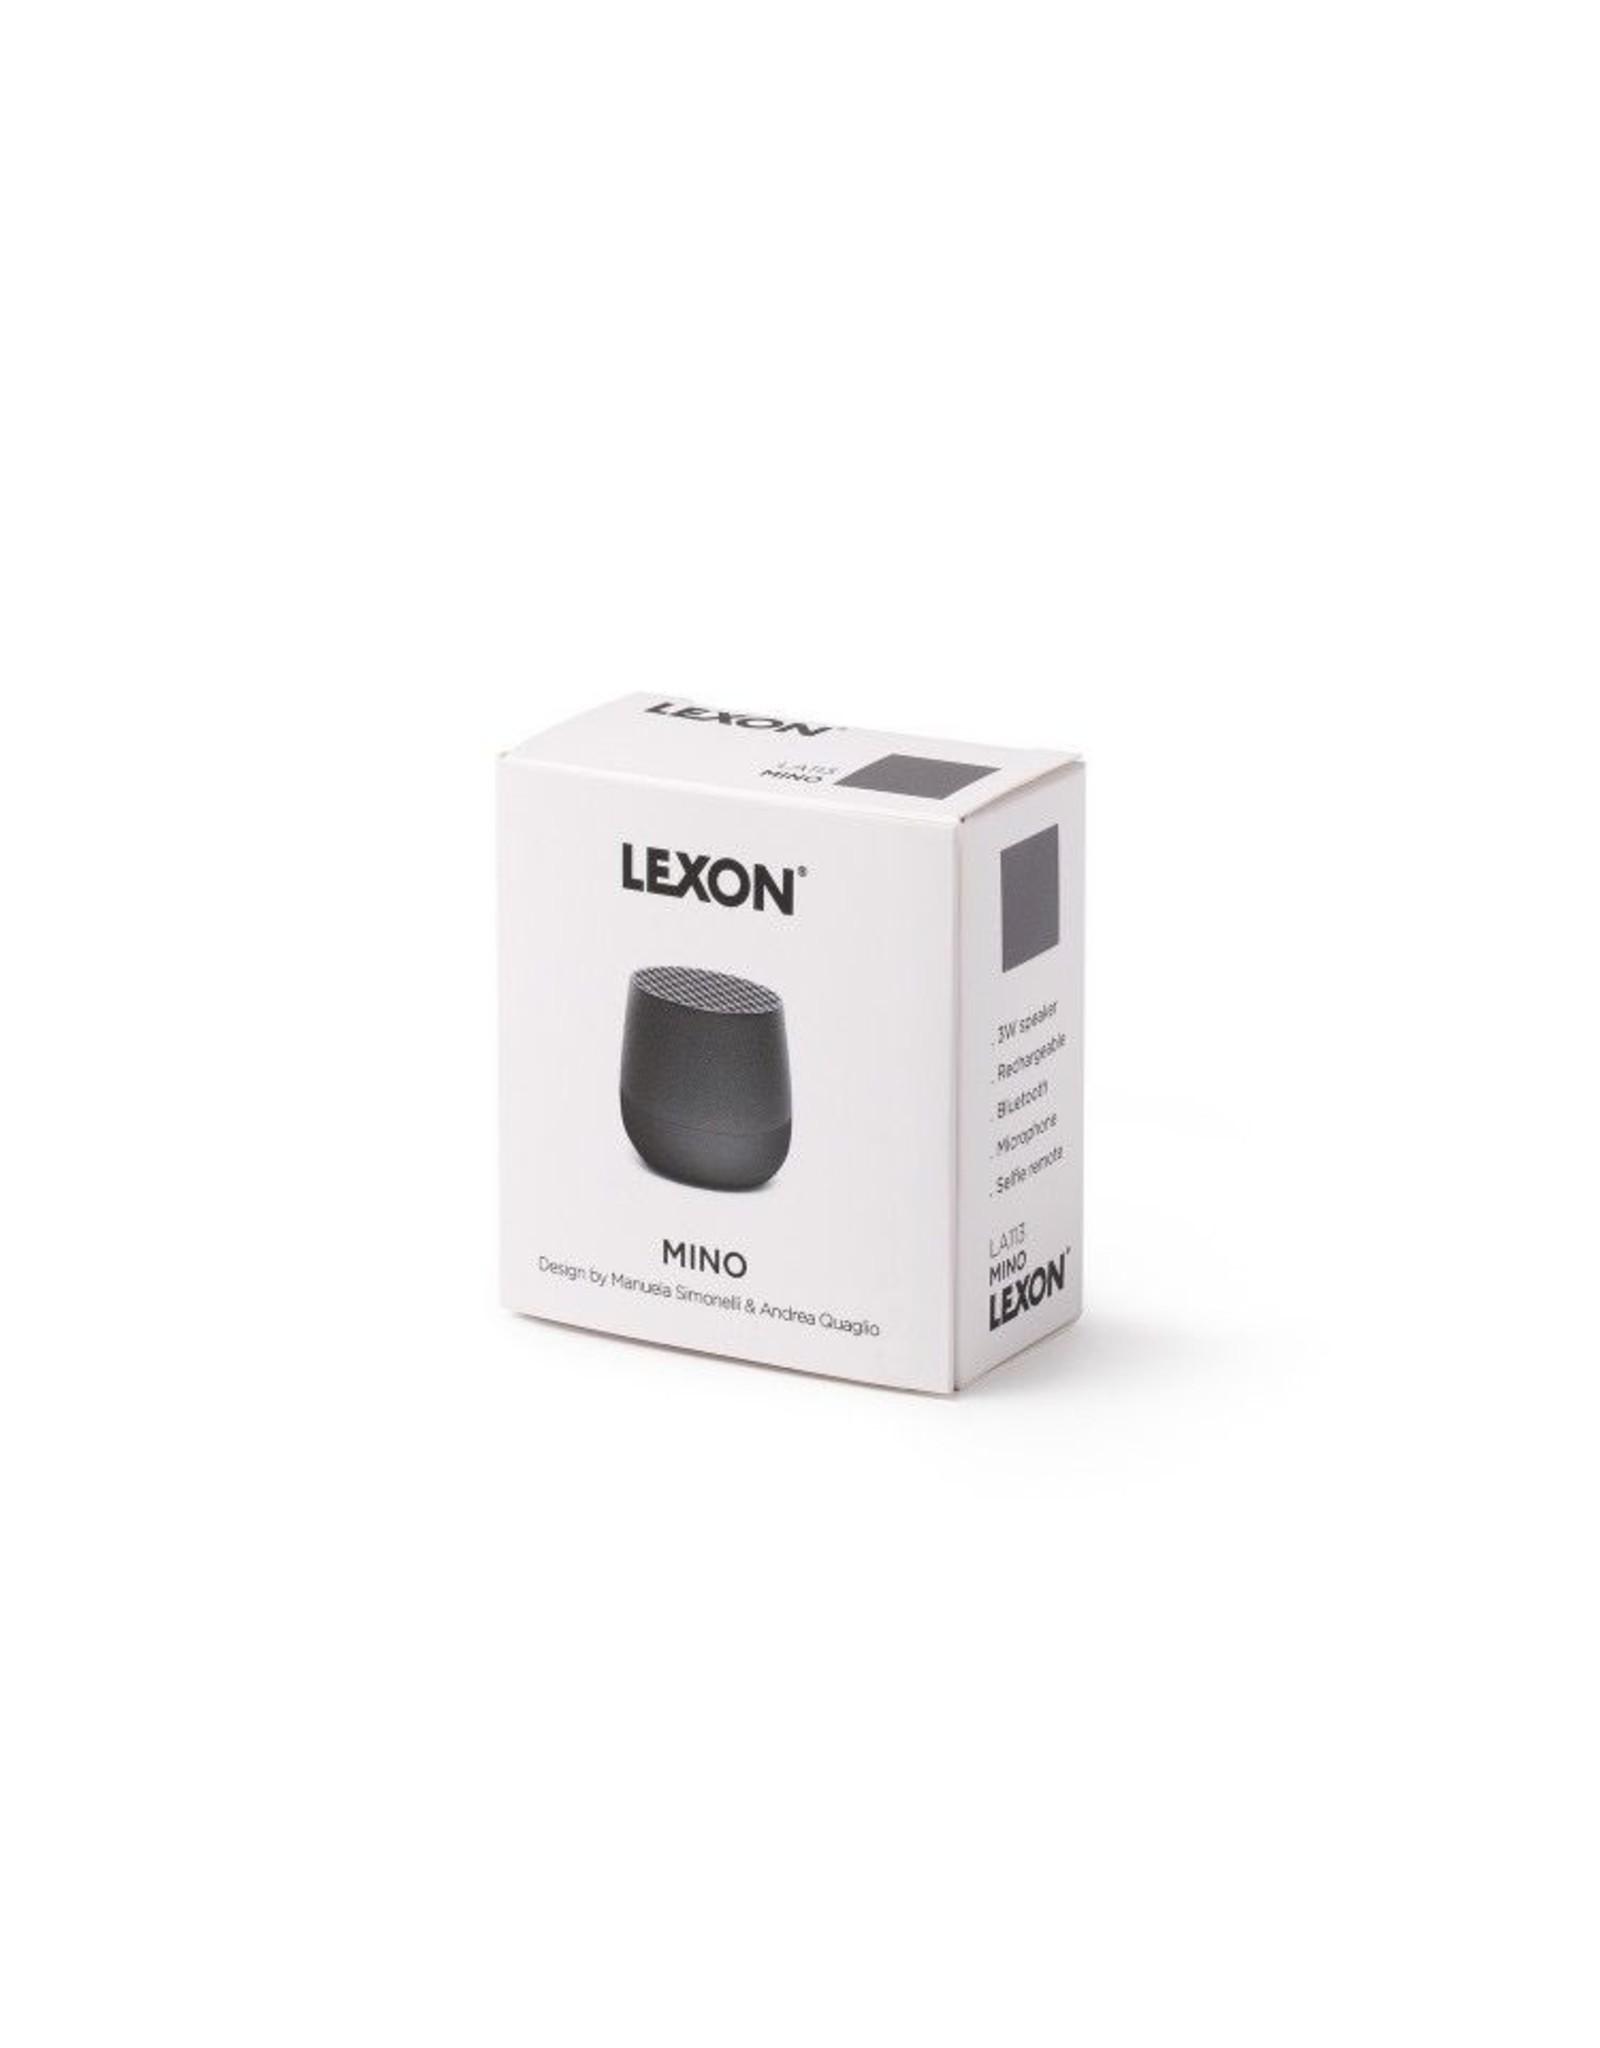 PREFIX DESIGN / LEXON LEXON MINO HAUT-PARLEURS ORANGE